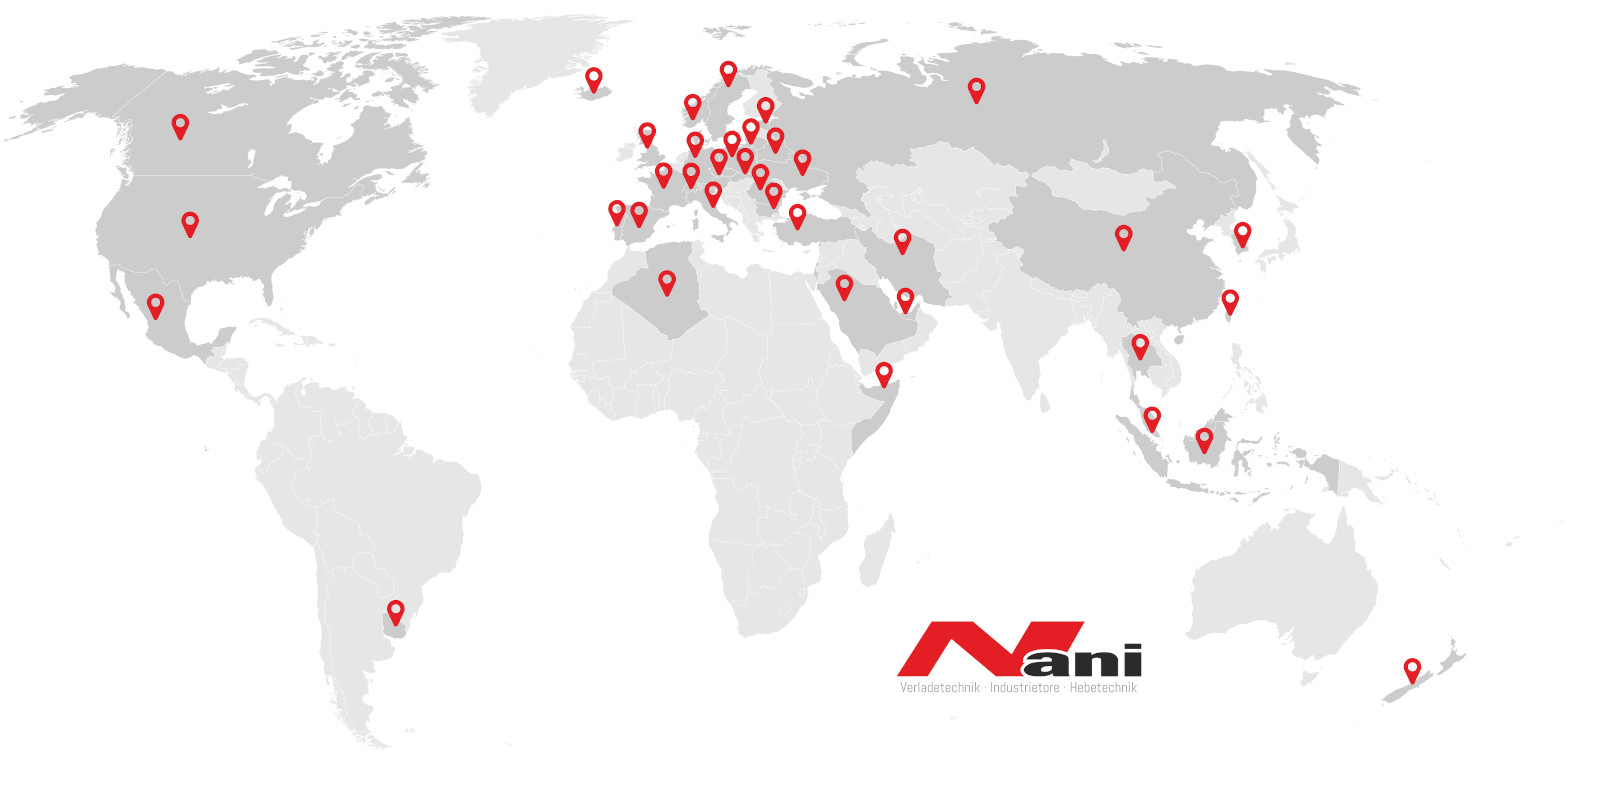 Nani - Global Presence